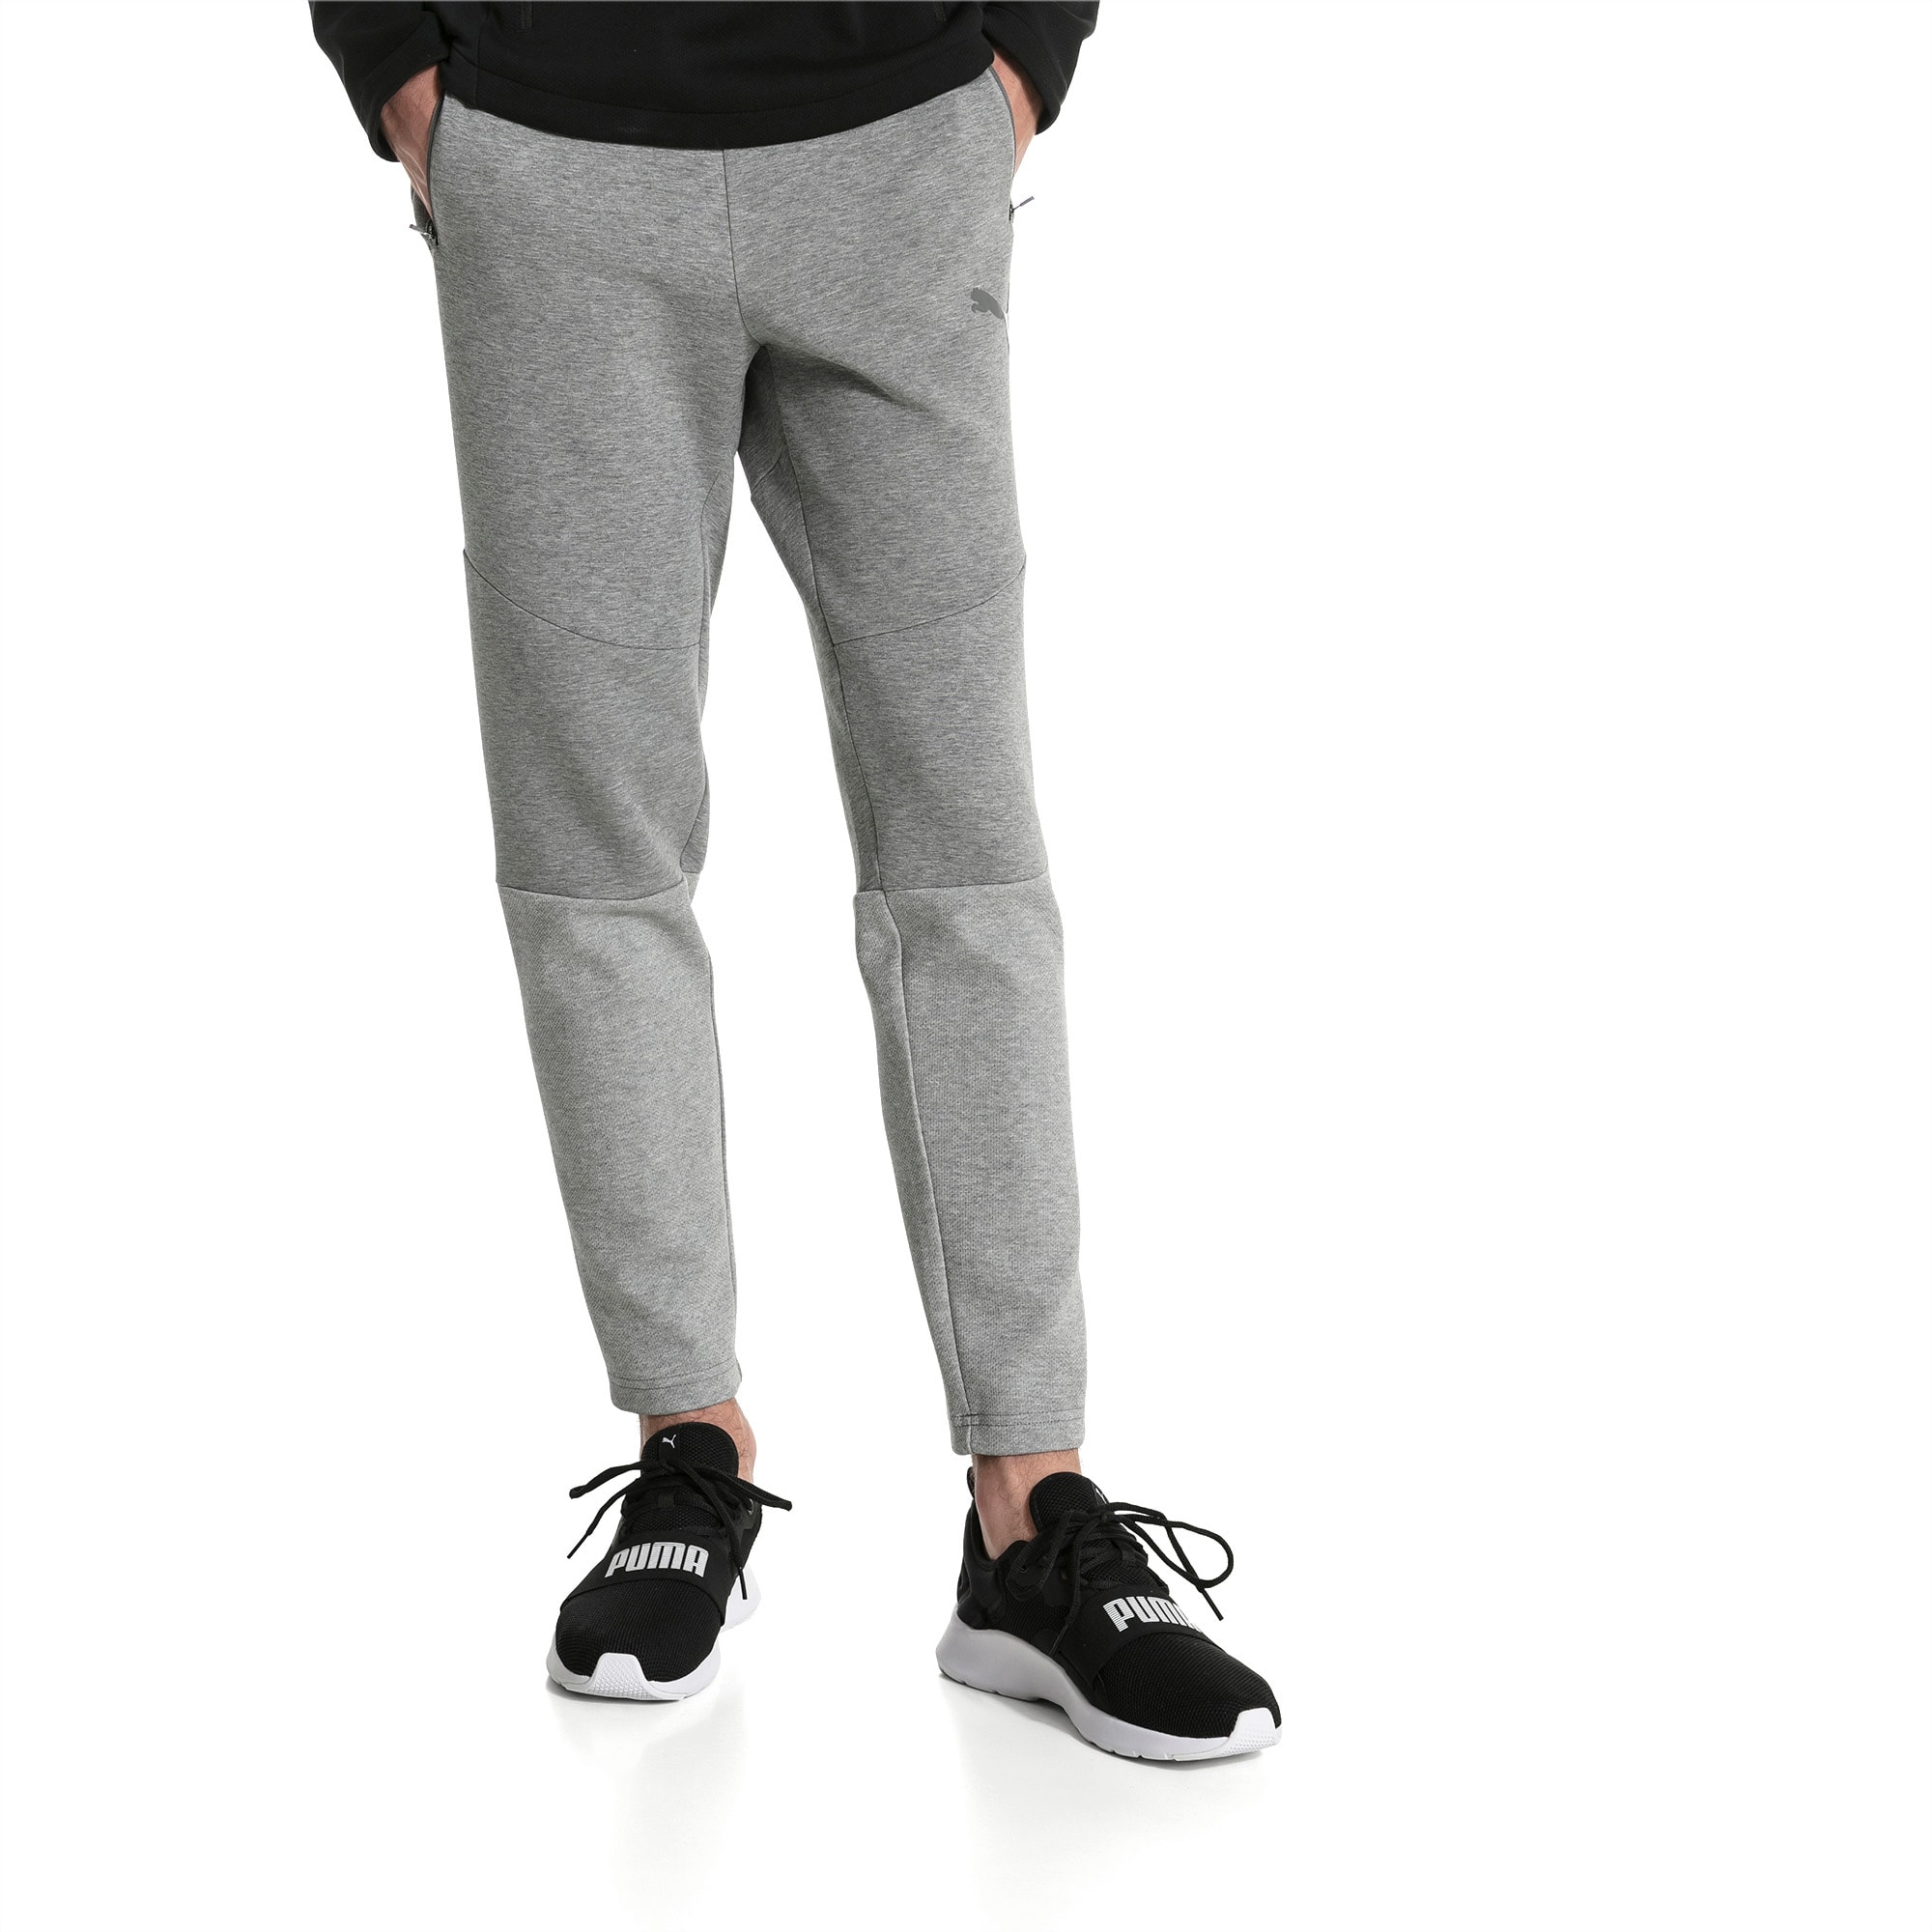 Pantalones Evostripe Move Knitted Para Hombre Medium Gray Heather Puma Fathers Day Puma Espana